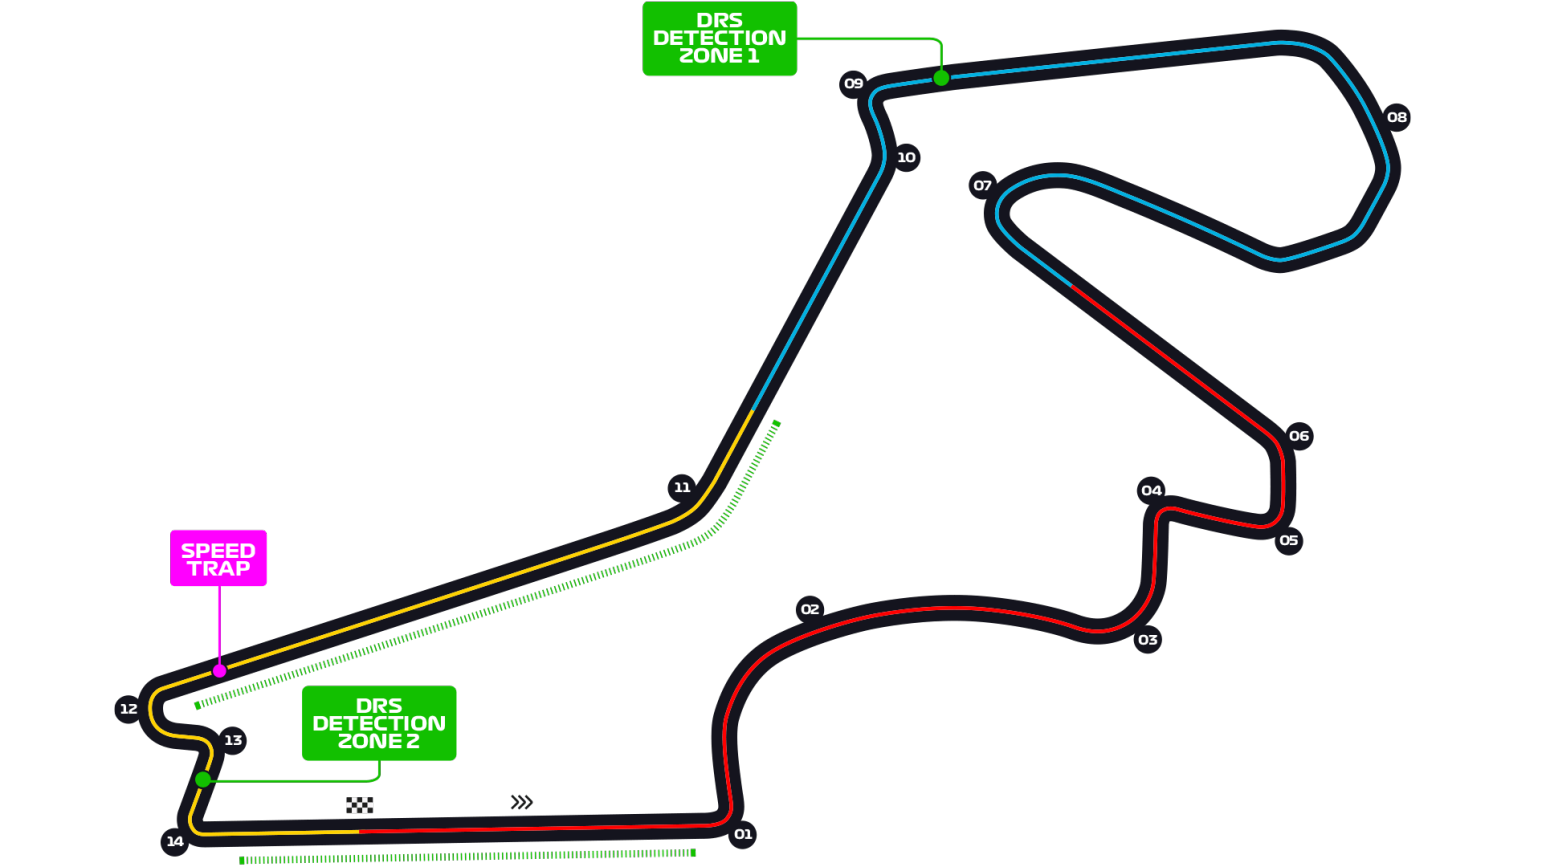 GP TURQUIE 2020 - Formula 1 DHL Turkish Grand Prix 2020 Image